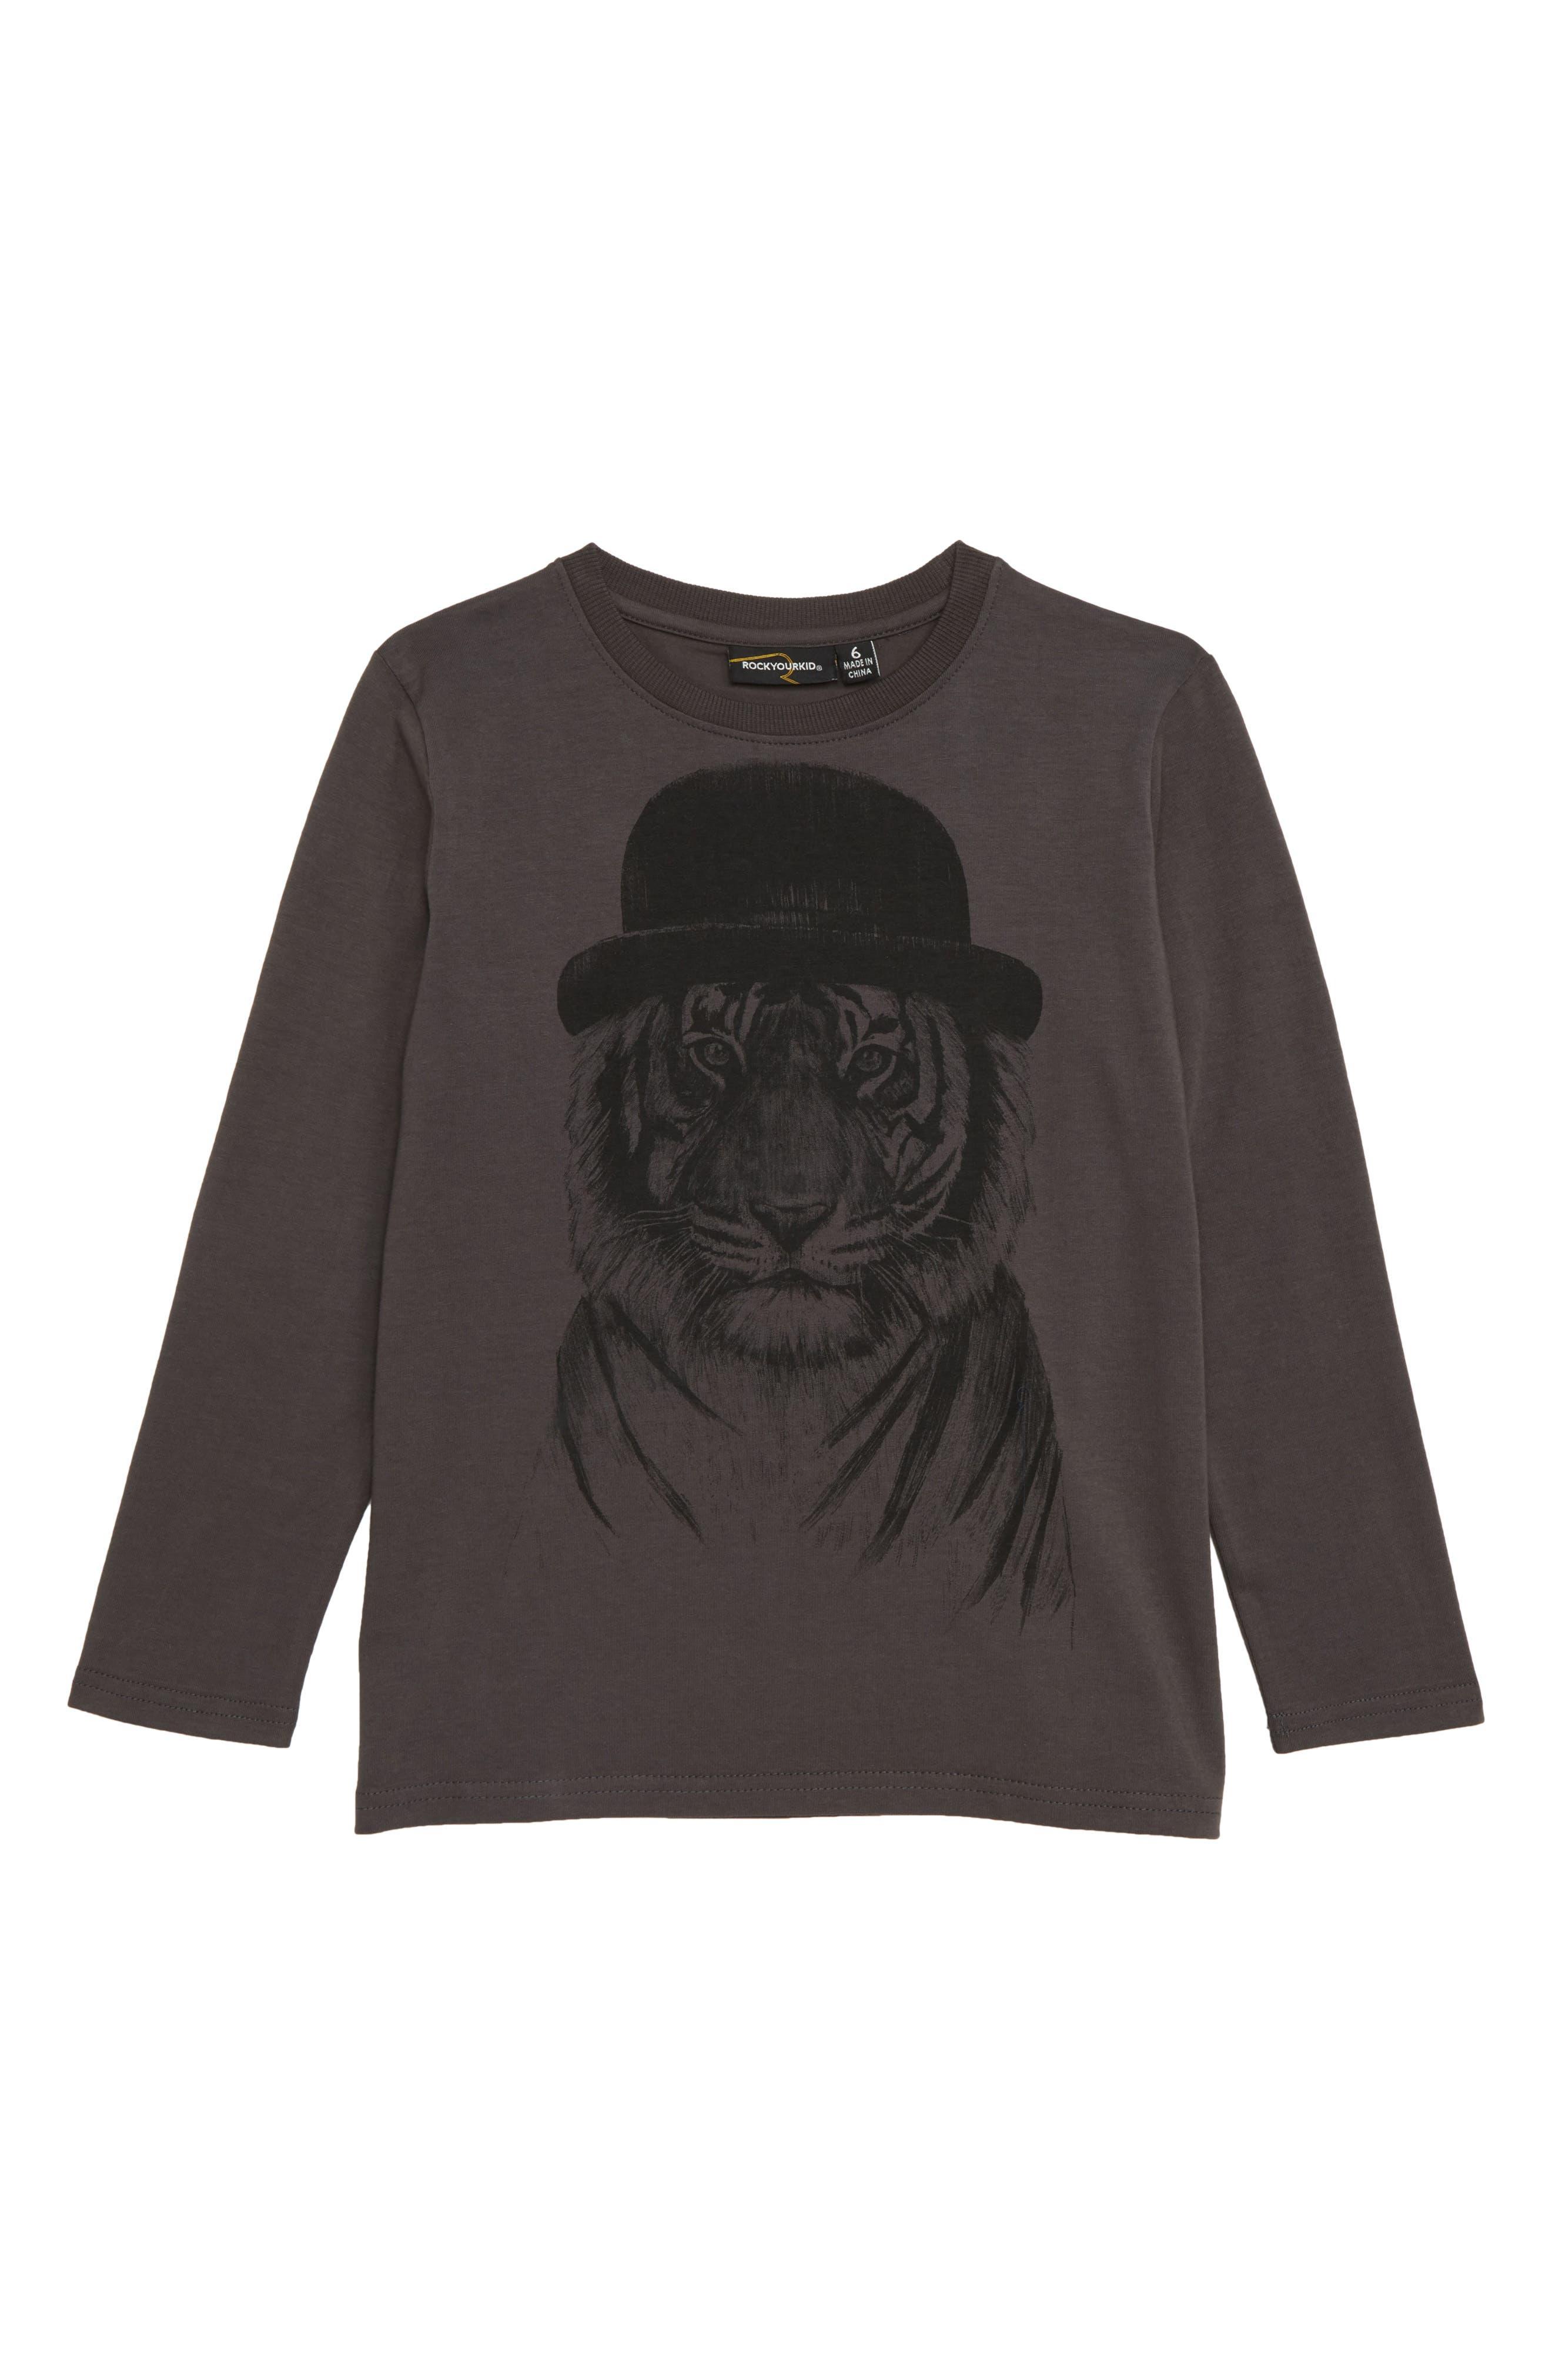 Sir T-Shirt,                         Main,                         color, 020